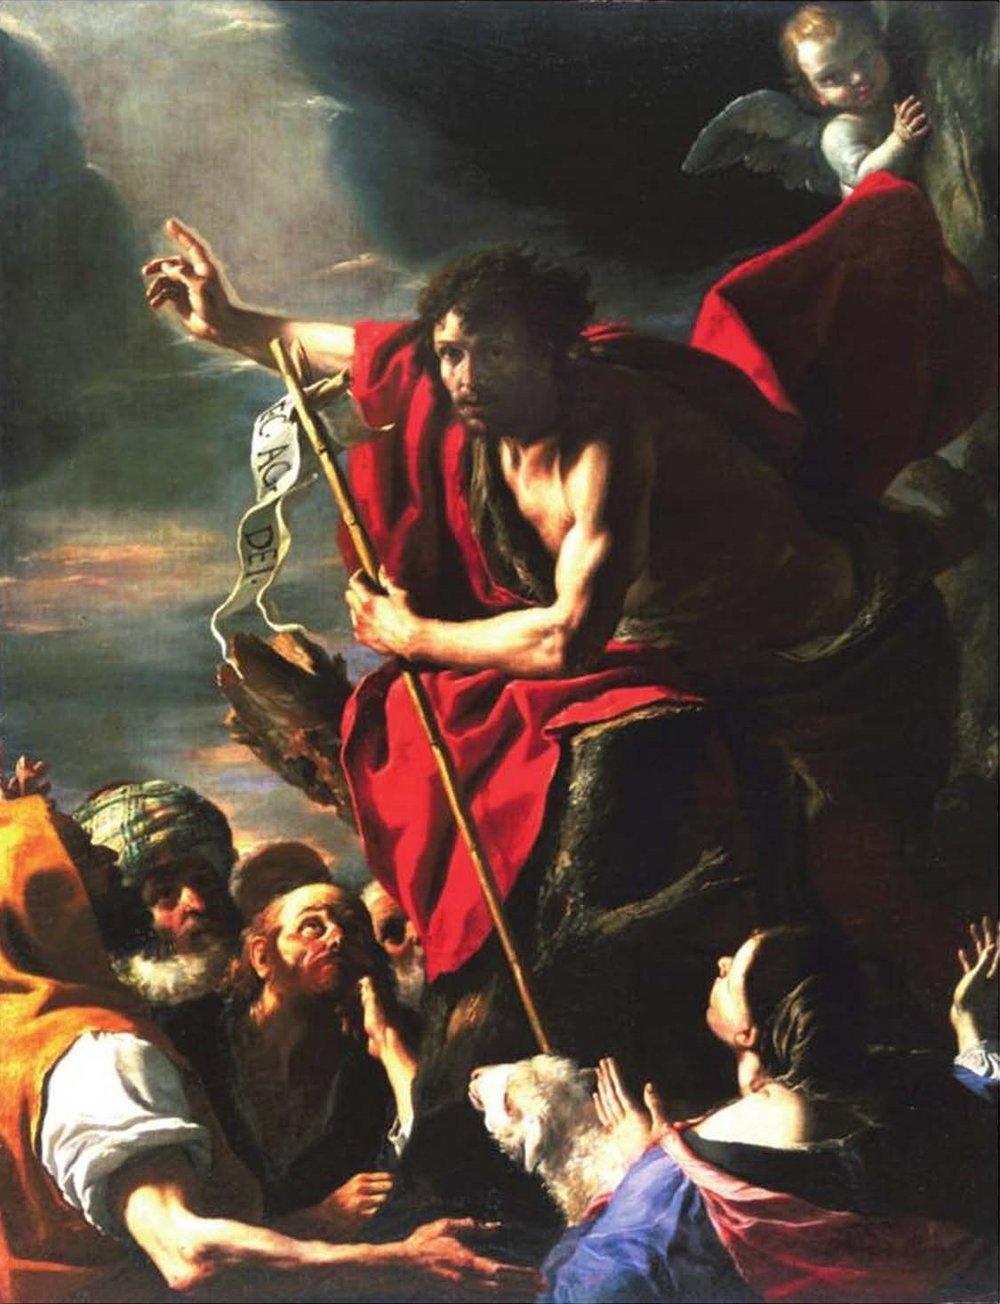 John the Baptist Preaching by Mattia Preti c. 1665